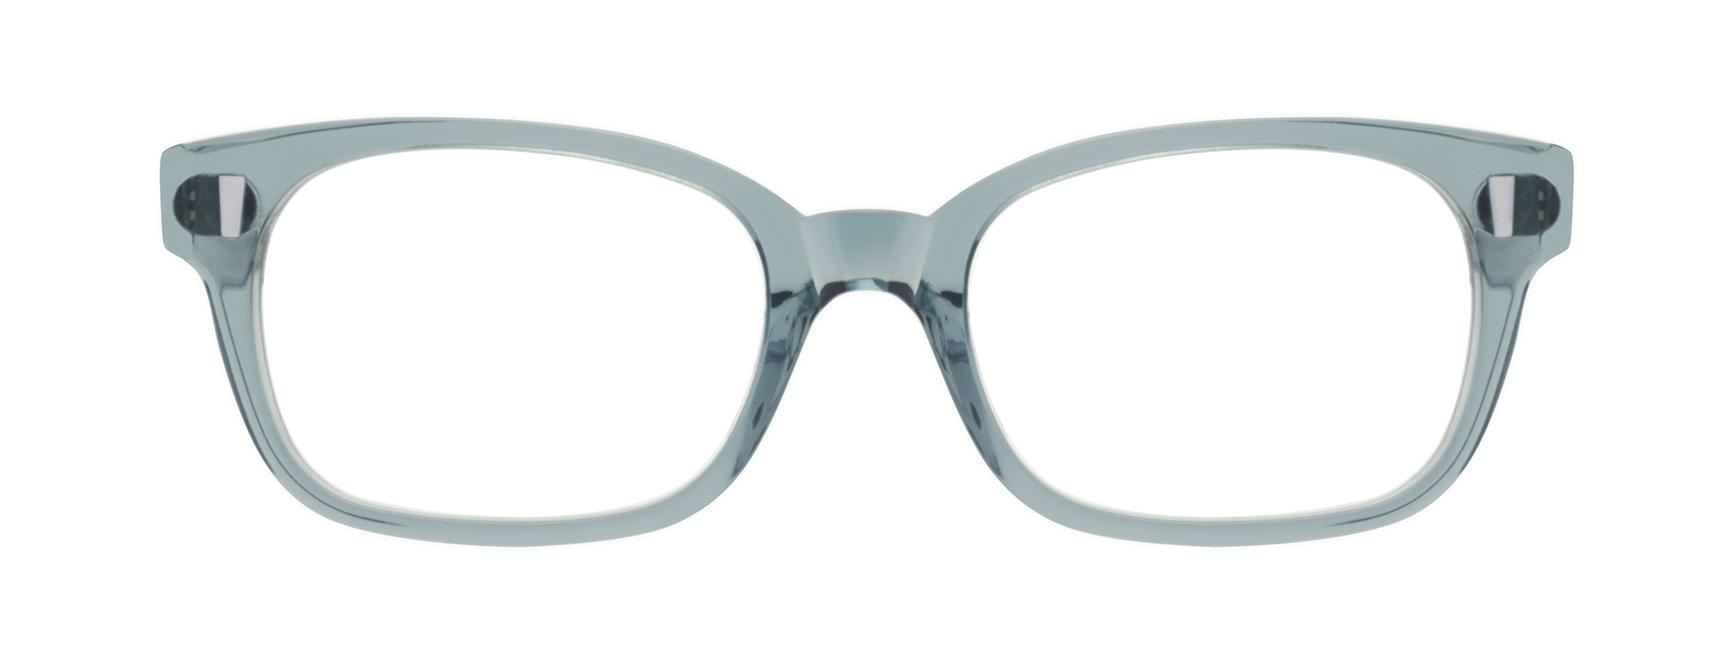 moscot-eyewear-ss2013-09